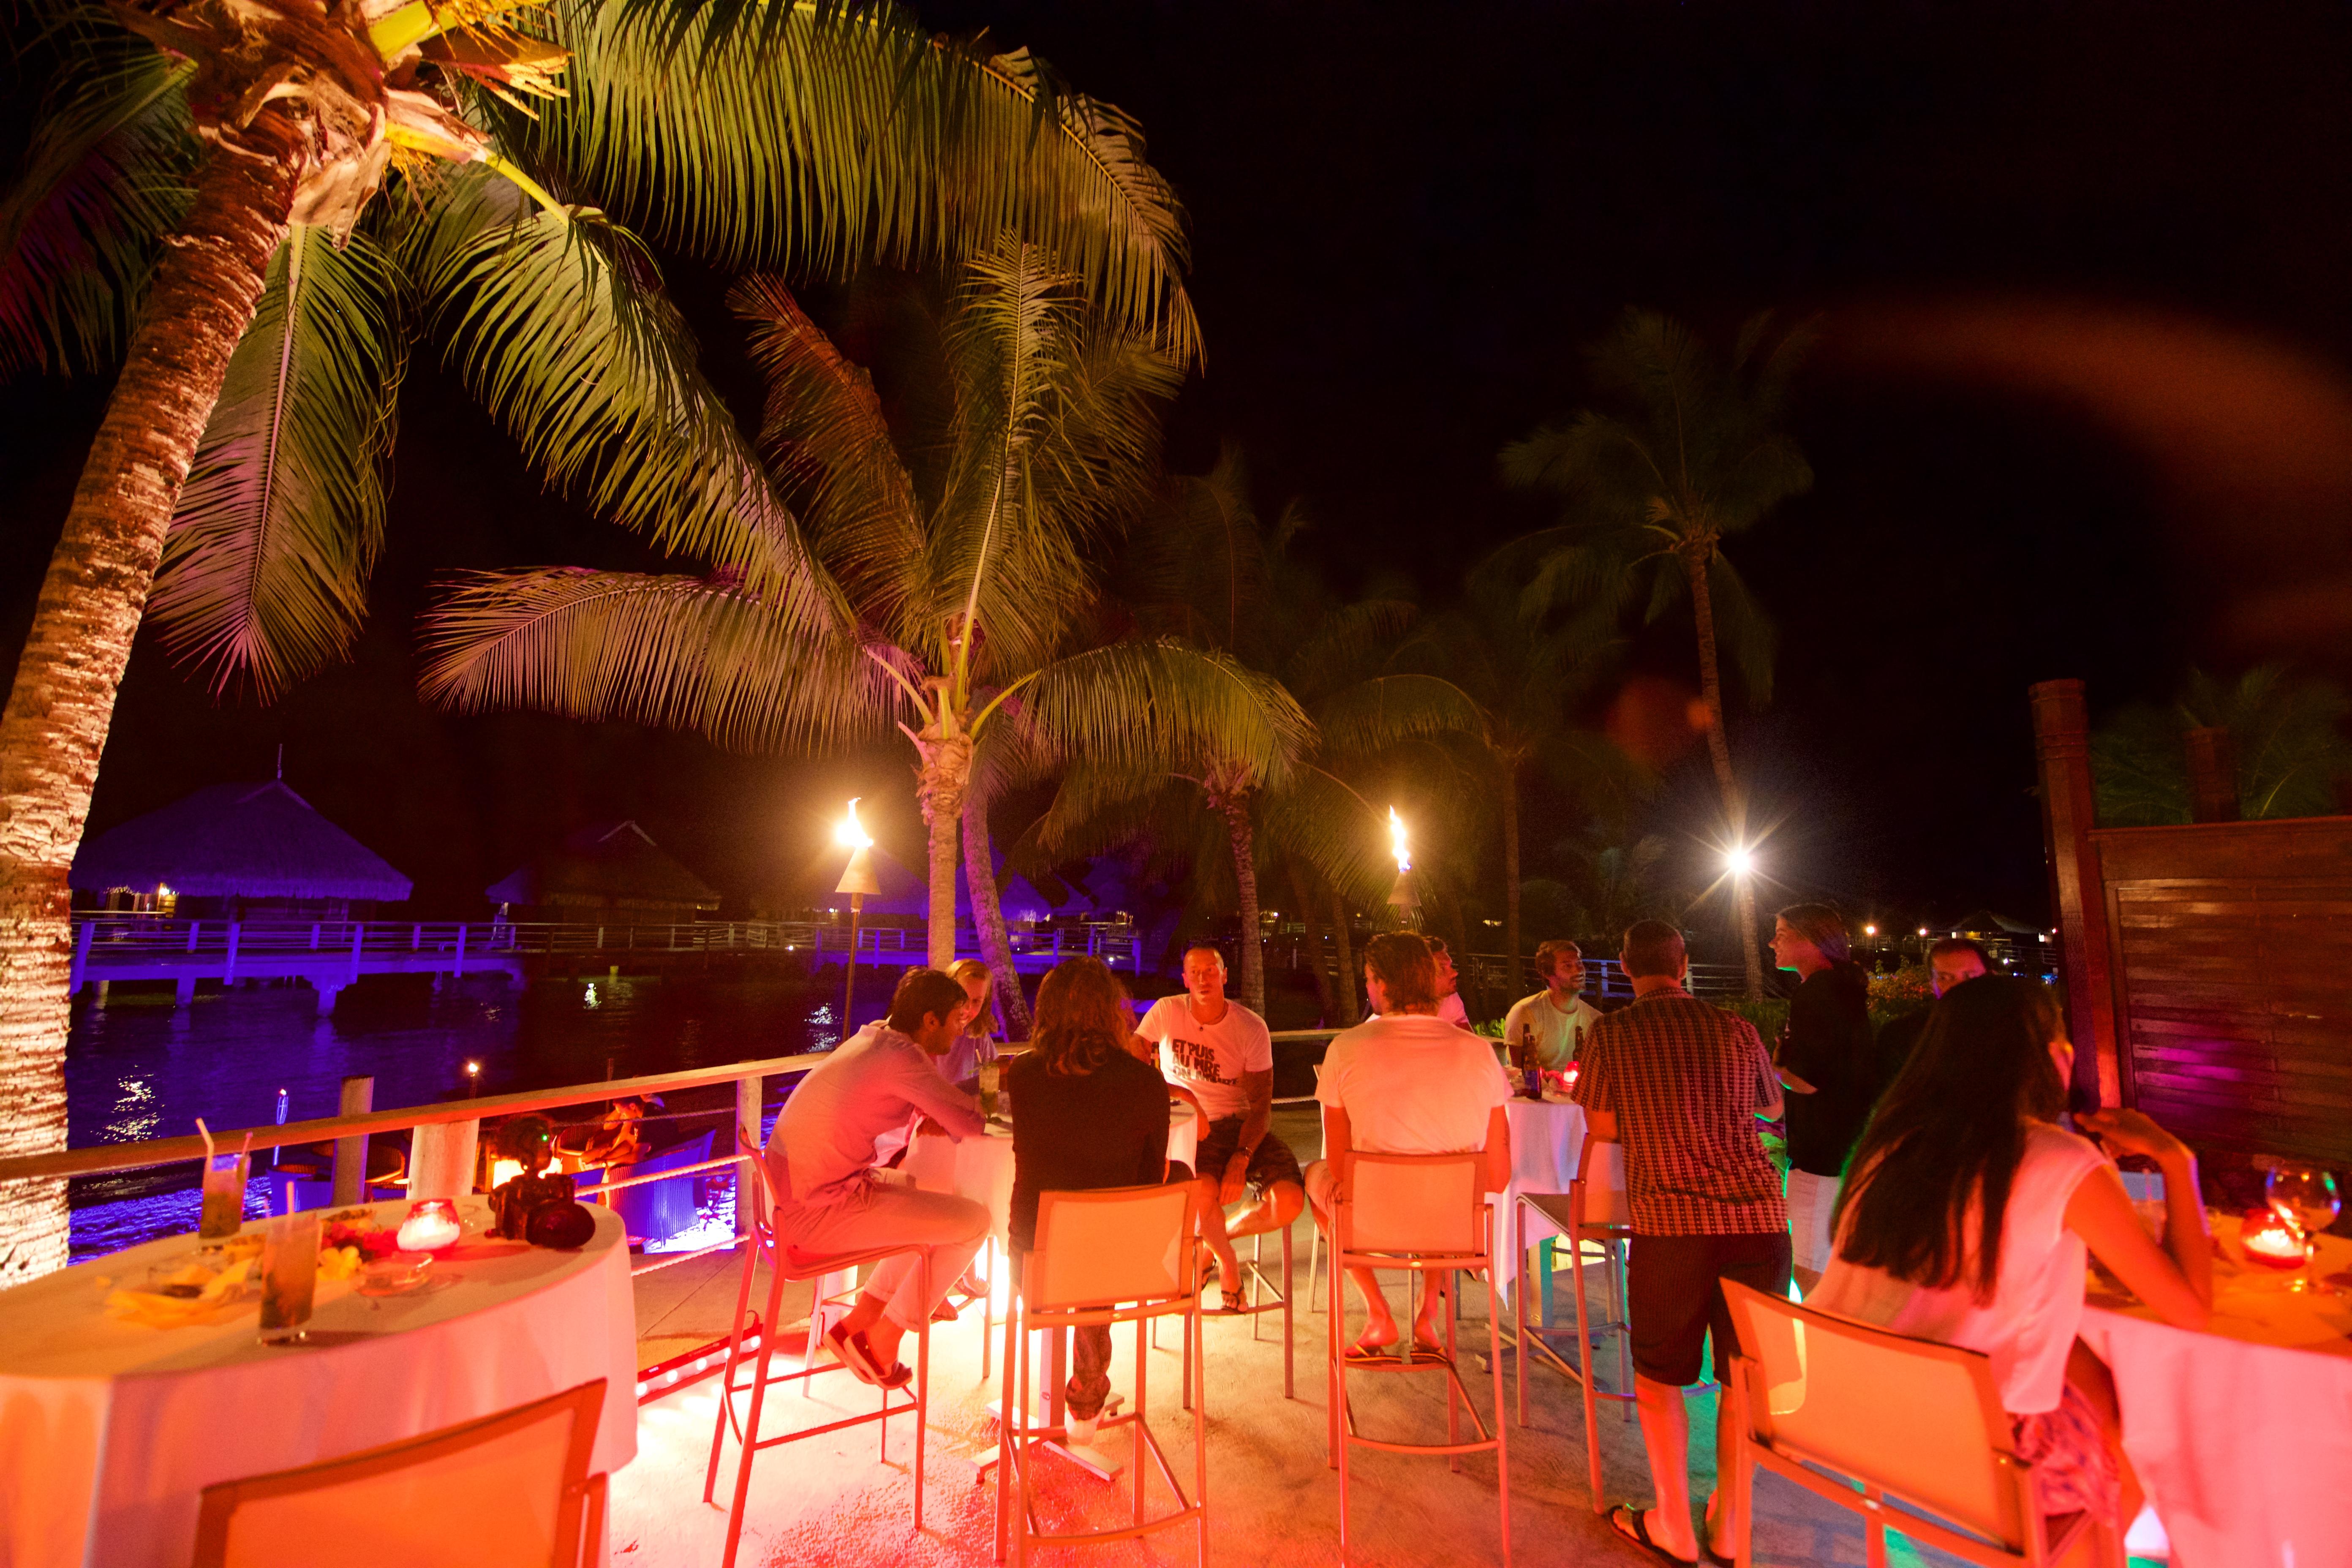 https://tahititourisme.cl/wp-content/uploads/2018/03/RESTAURATION-Matahiehani-Lounge-Bar-featured_image-Tim_McKenna.jpg